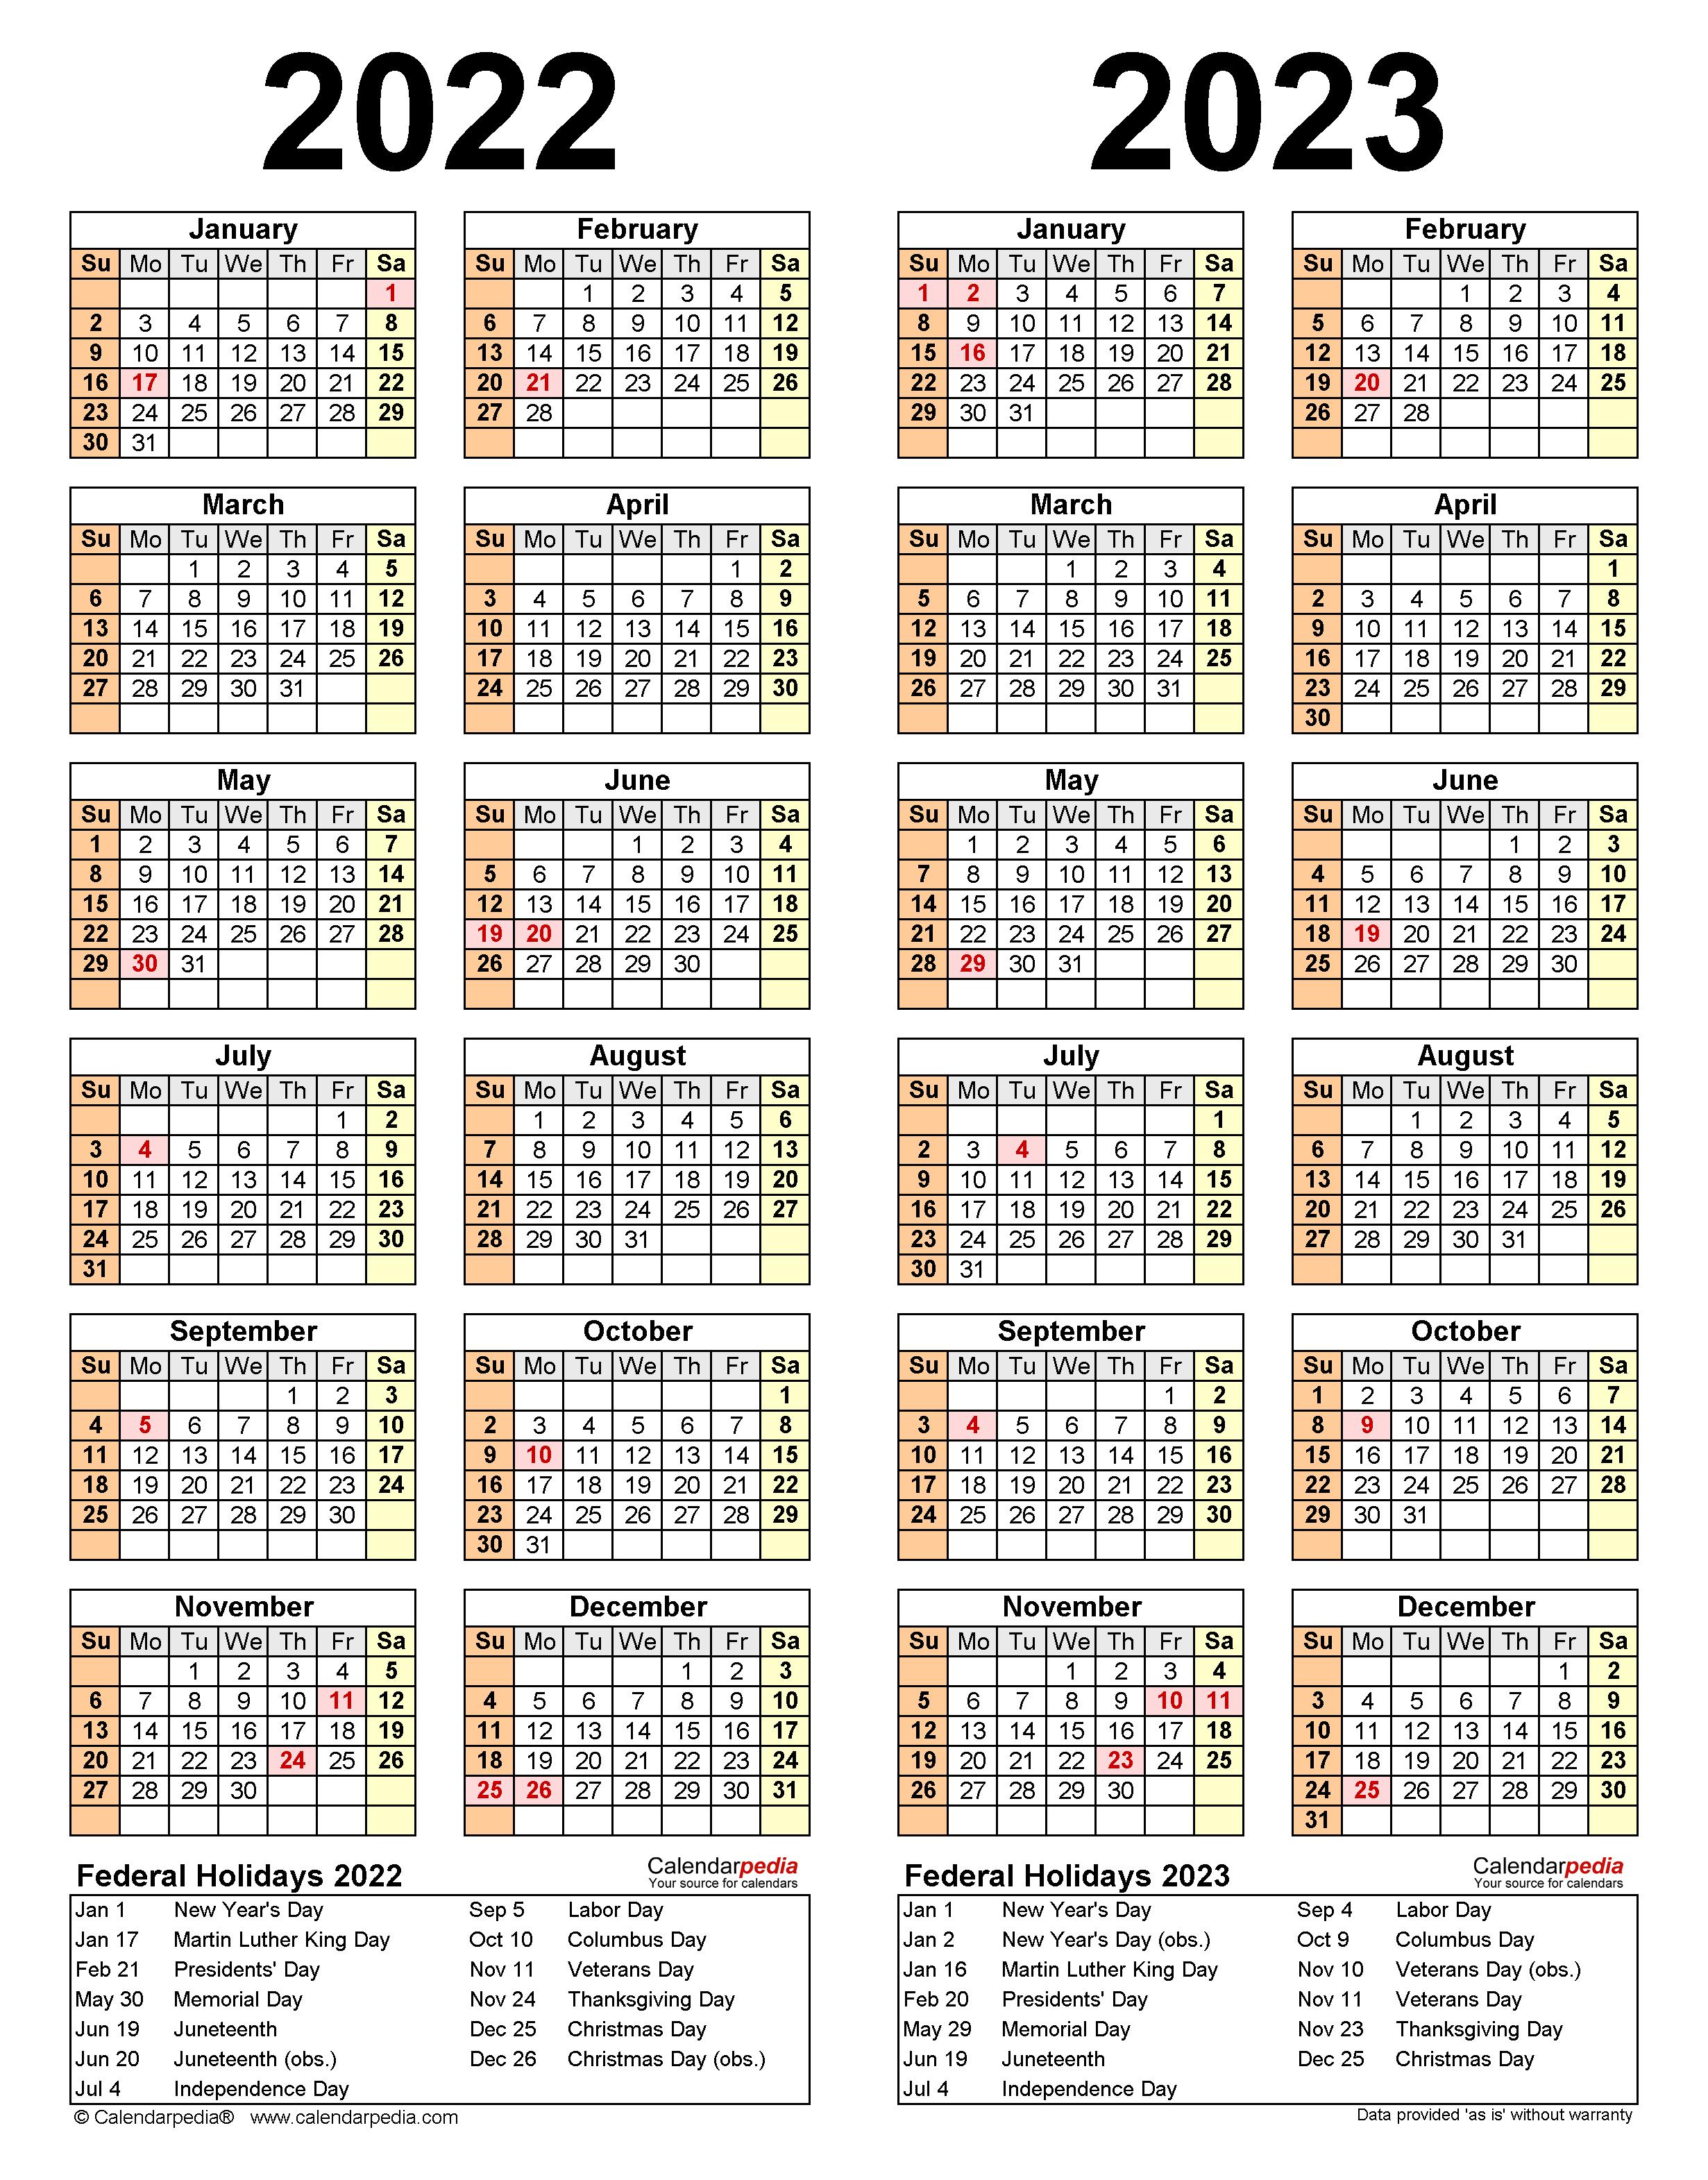 Yale Calendar 2022 2023.2022 2023 Two Year Calendar Free Printable Excel Templates